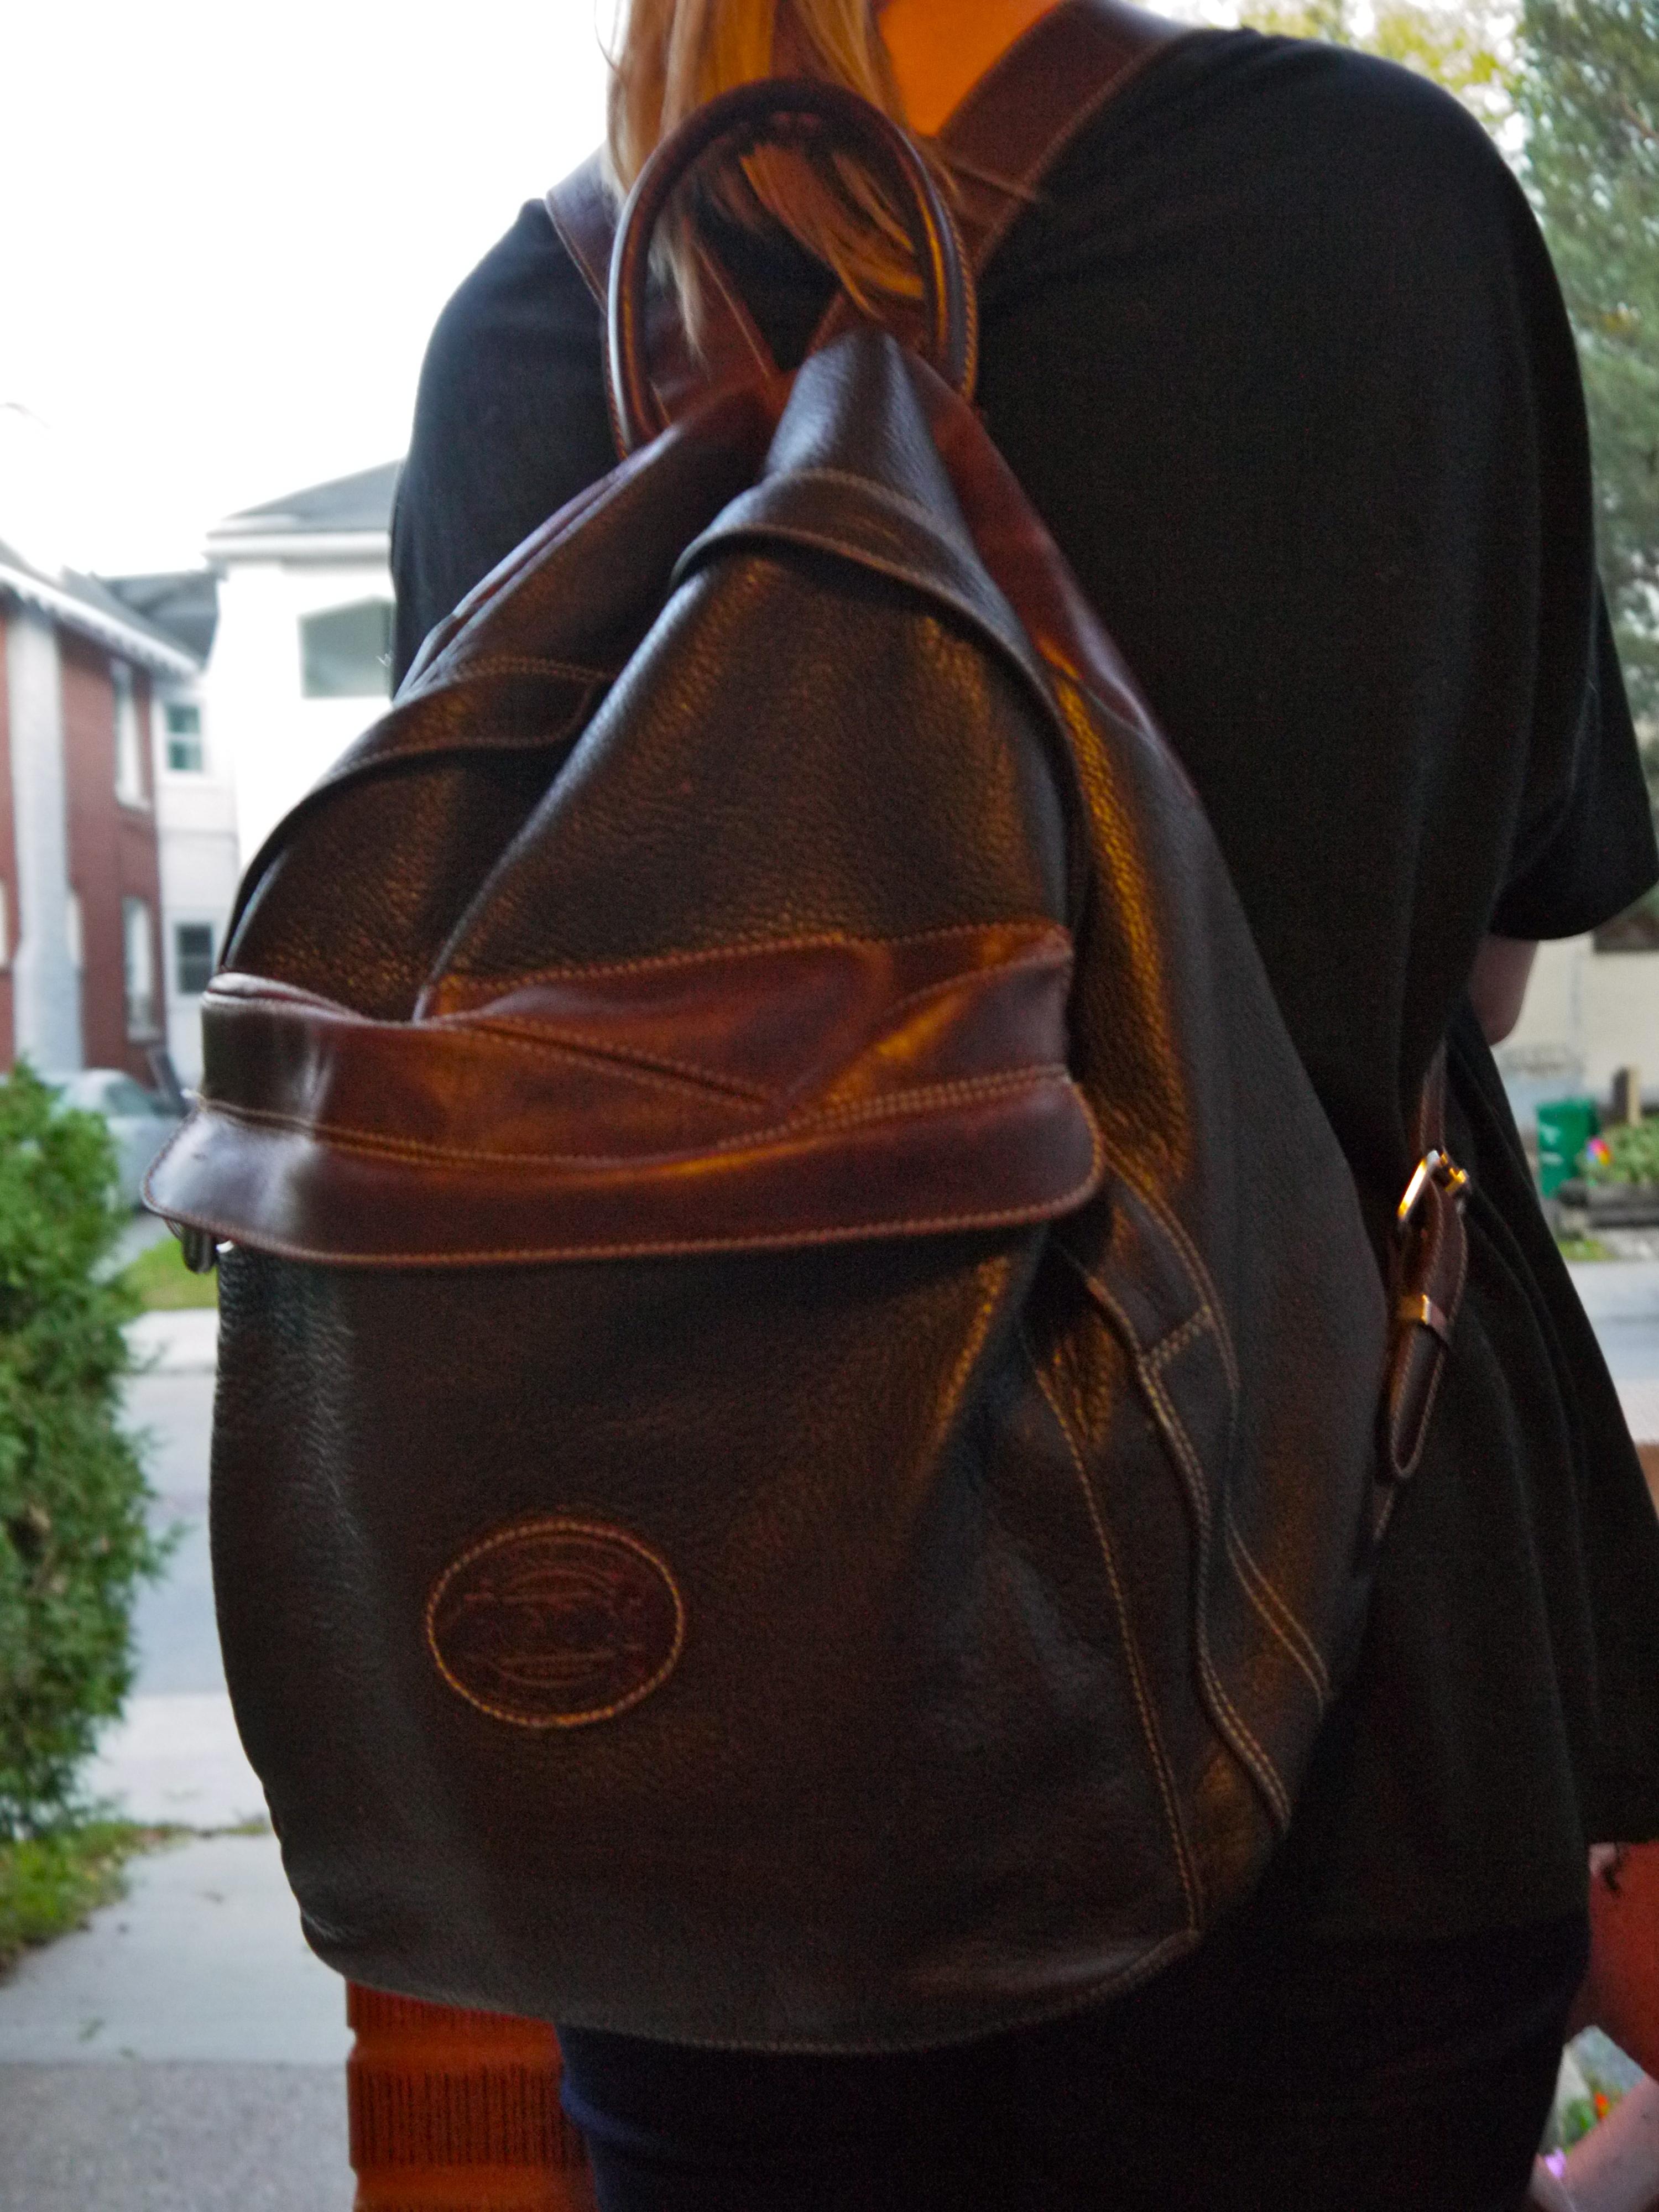 7 First Week Fresh: The Backpack- Leather | Twenty Bliss